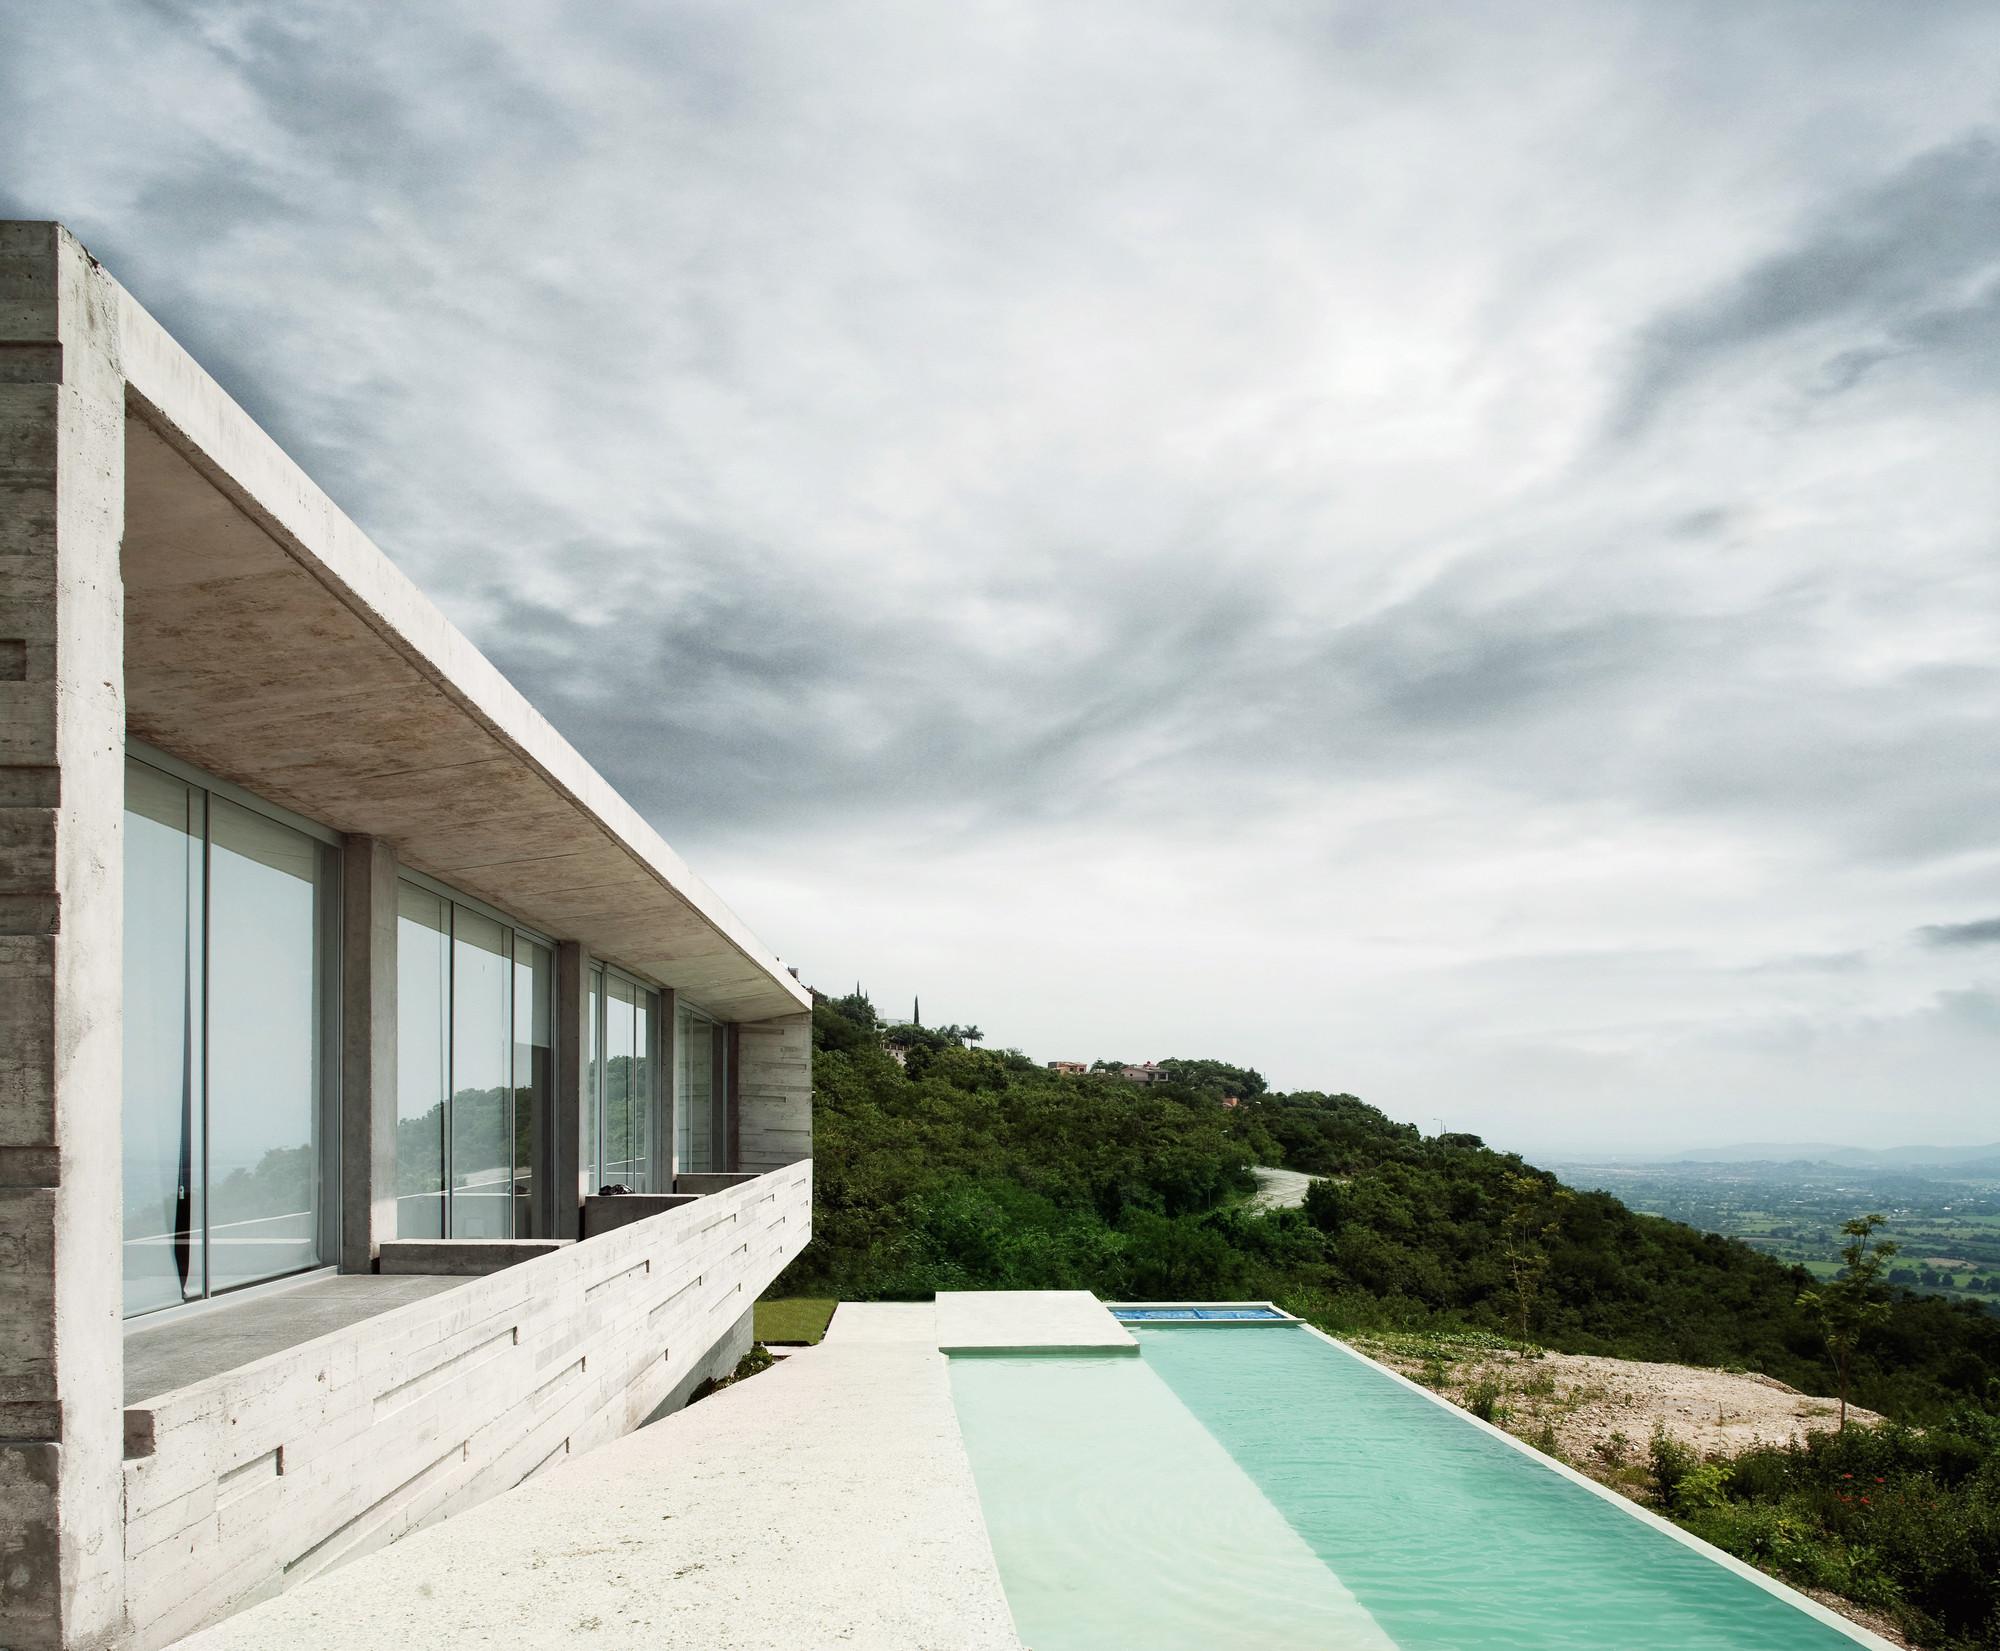 Casa Widescreen / R Zero Studio, © Pedro Iriart